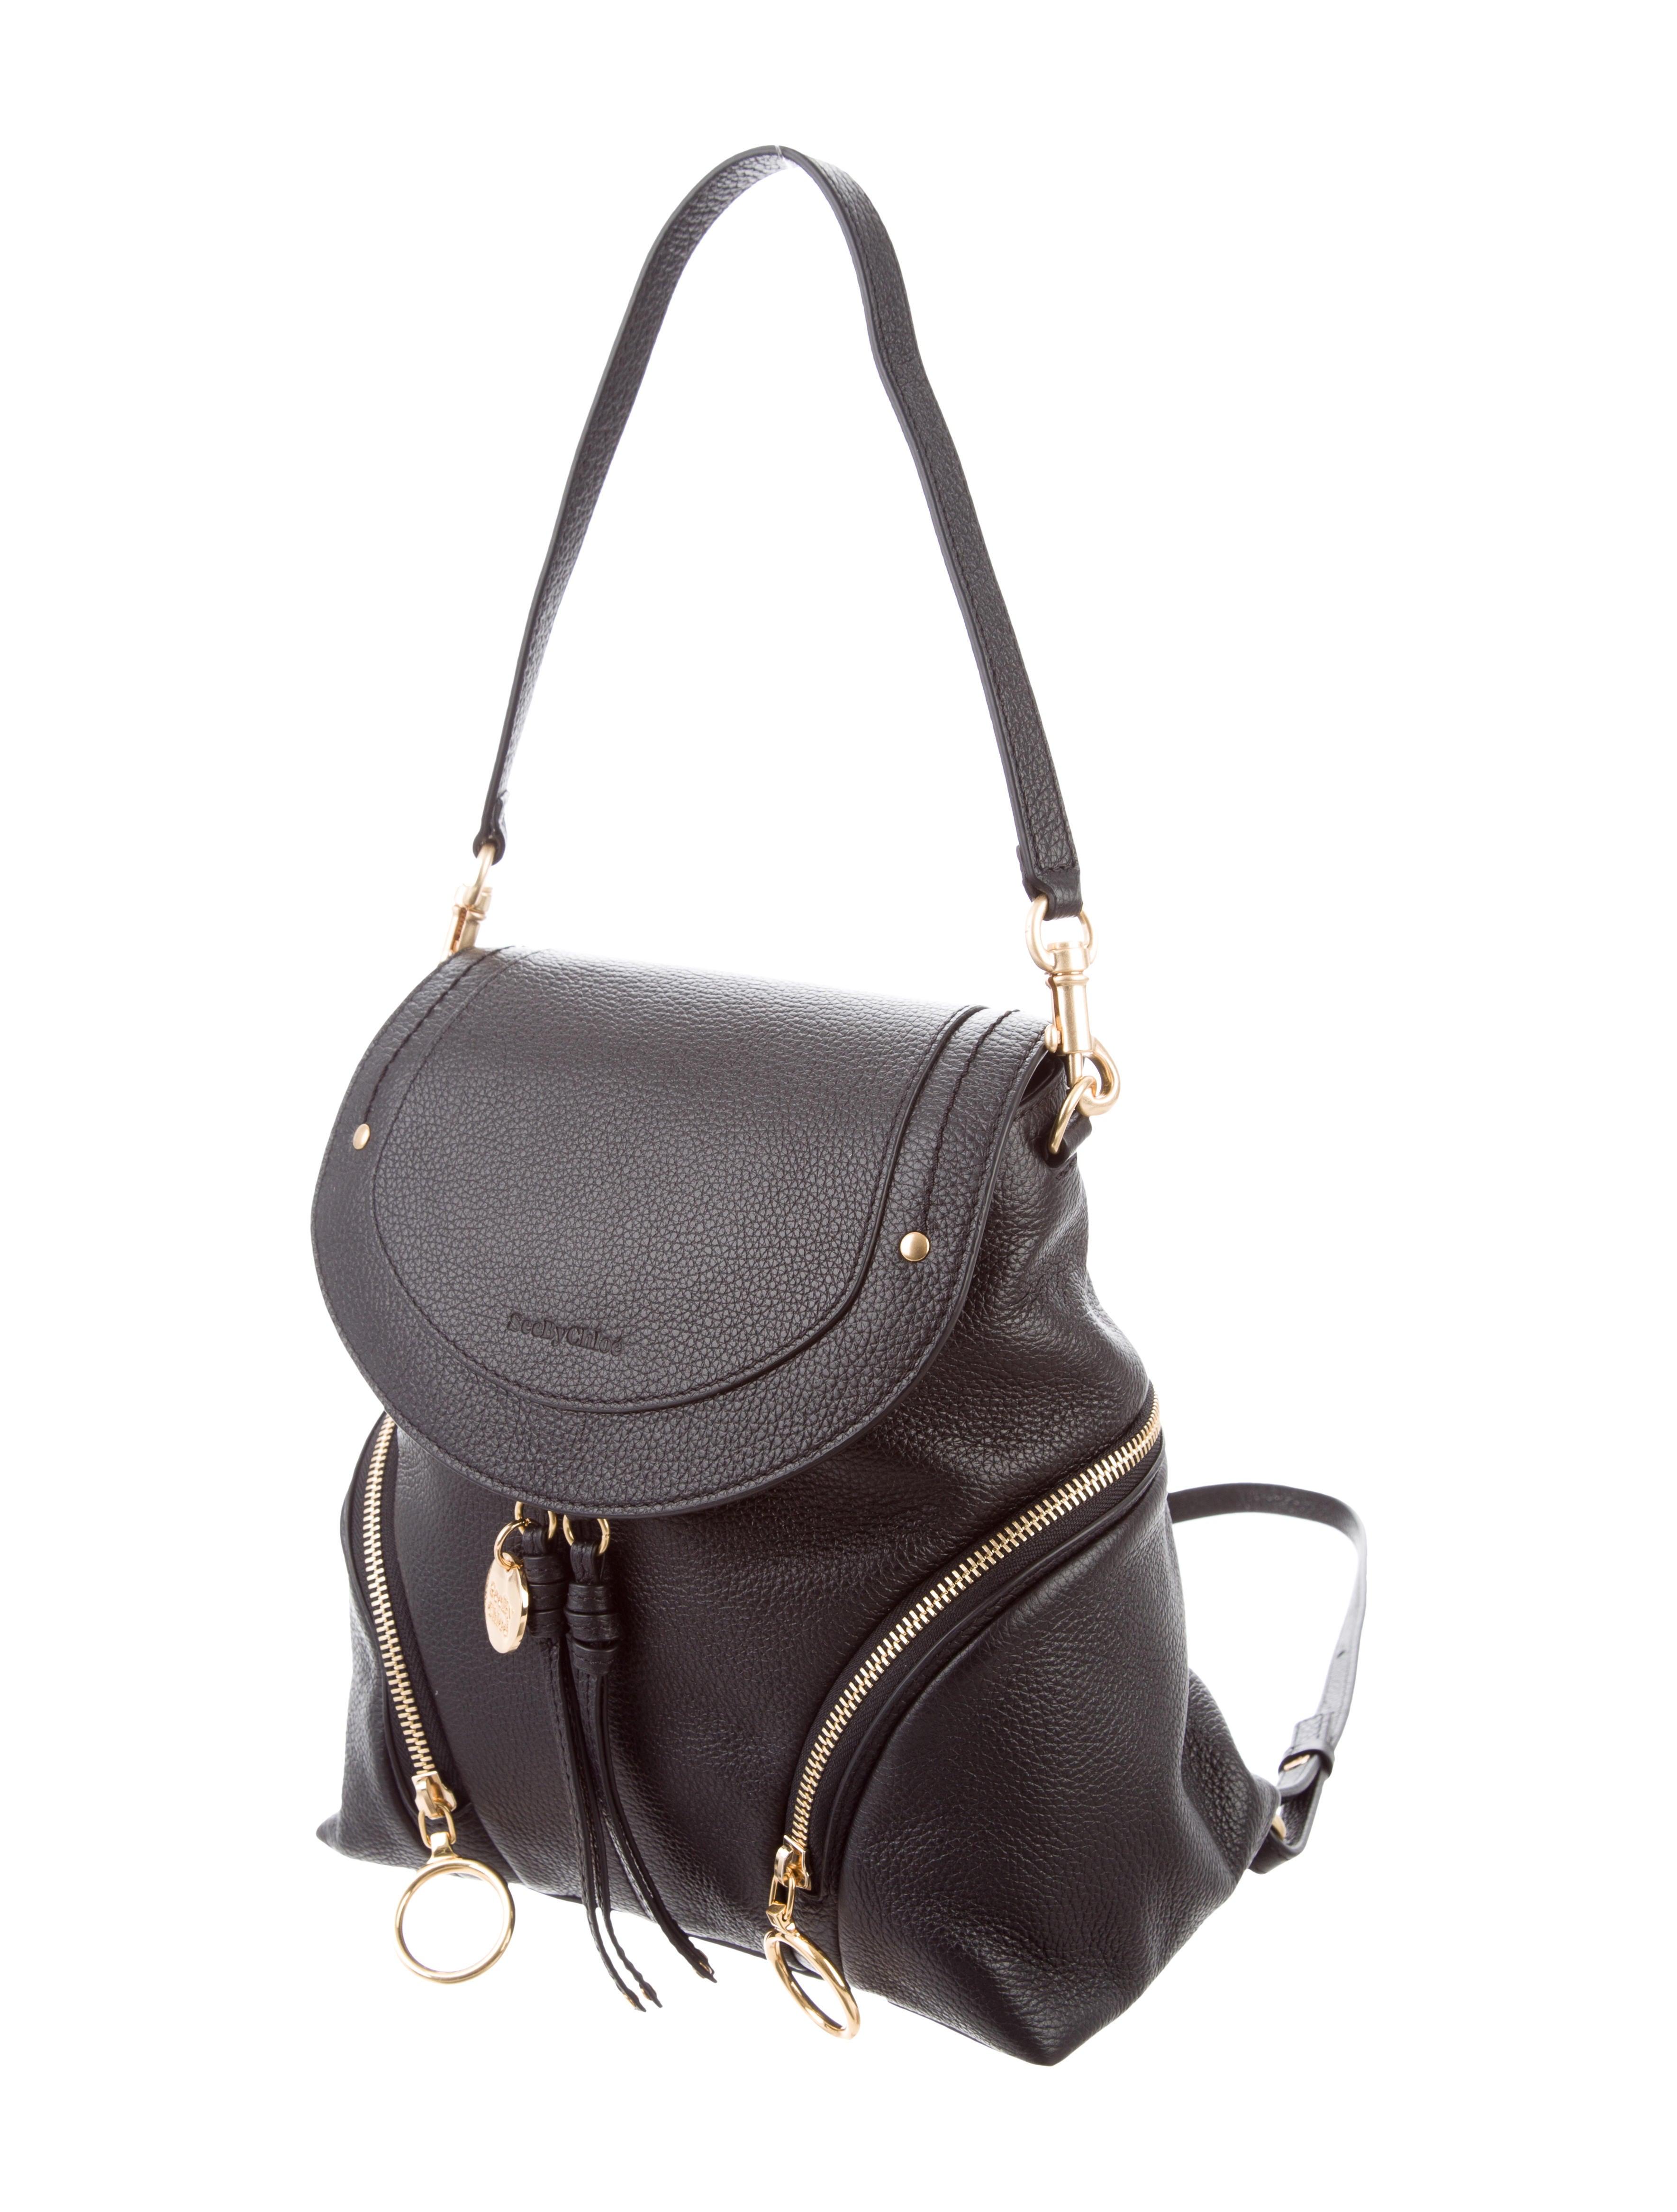 Small Convertible Handbag Backpack Best Handbag 2018